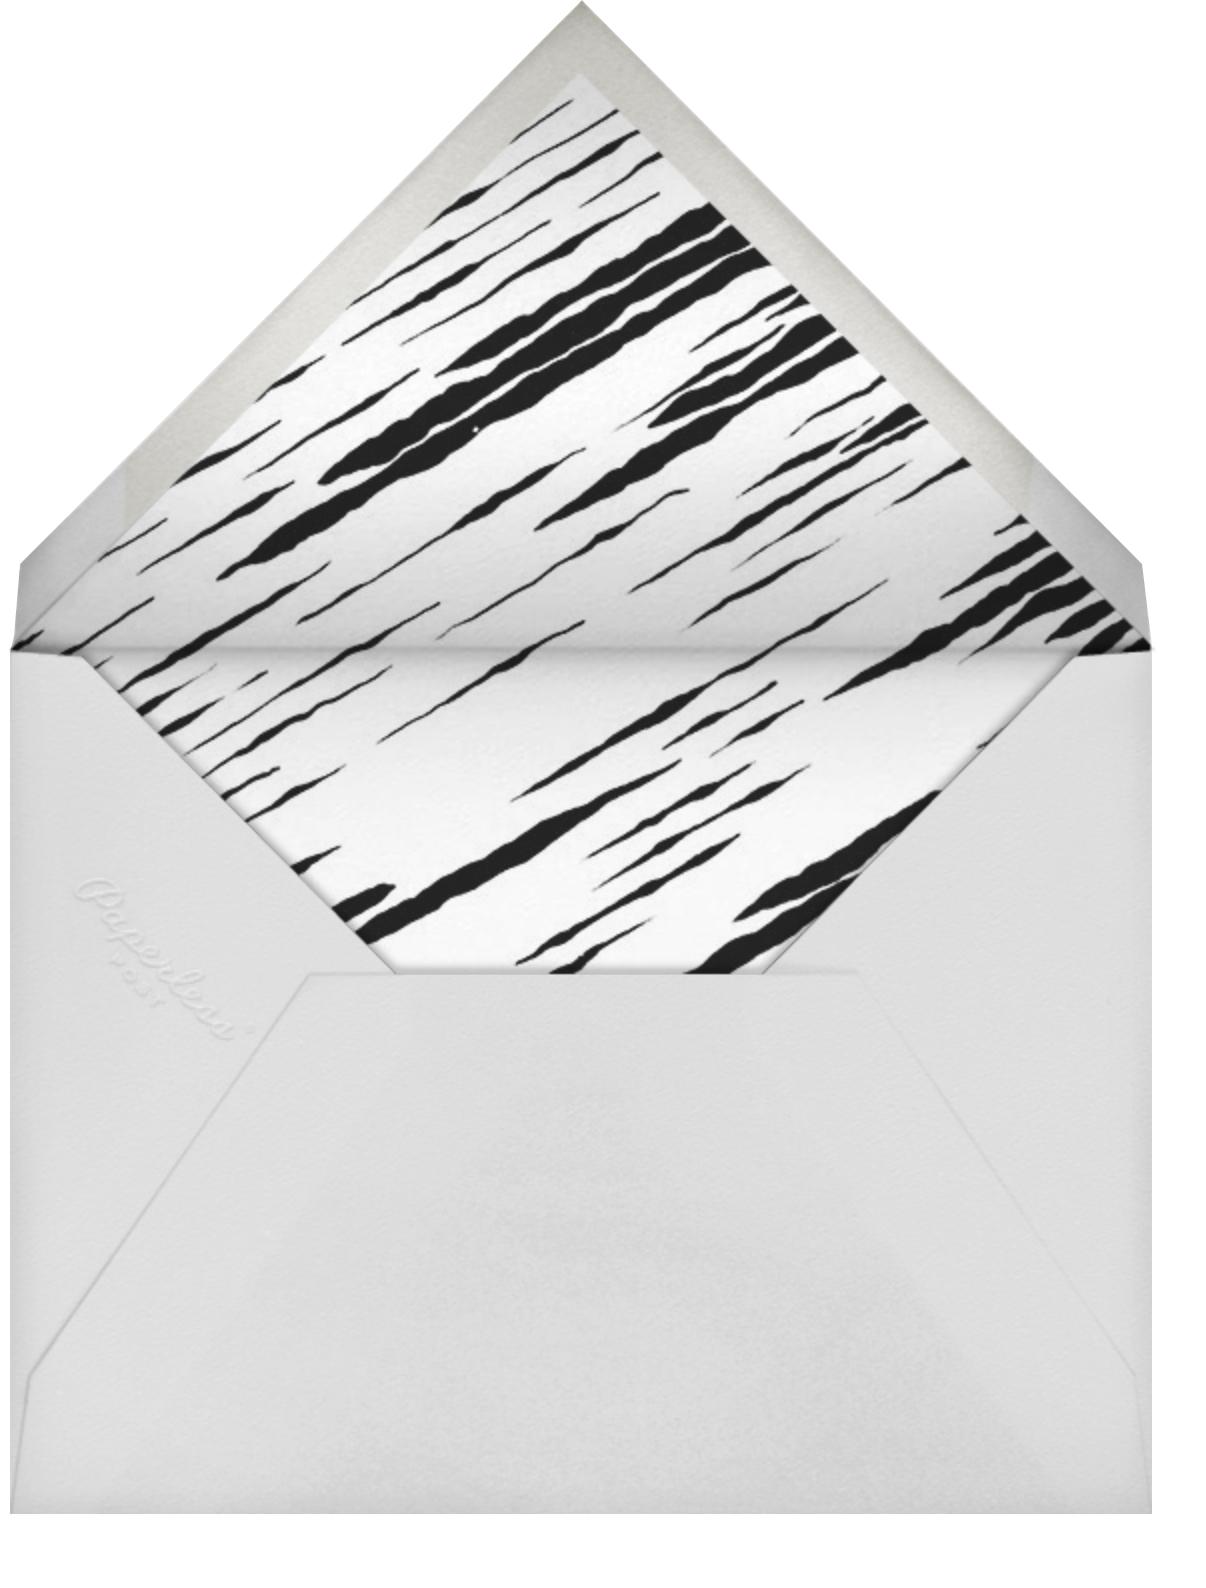 Feline - Metallic - Kelly Wearstler - Cocktail party - envelope back